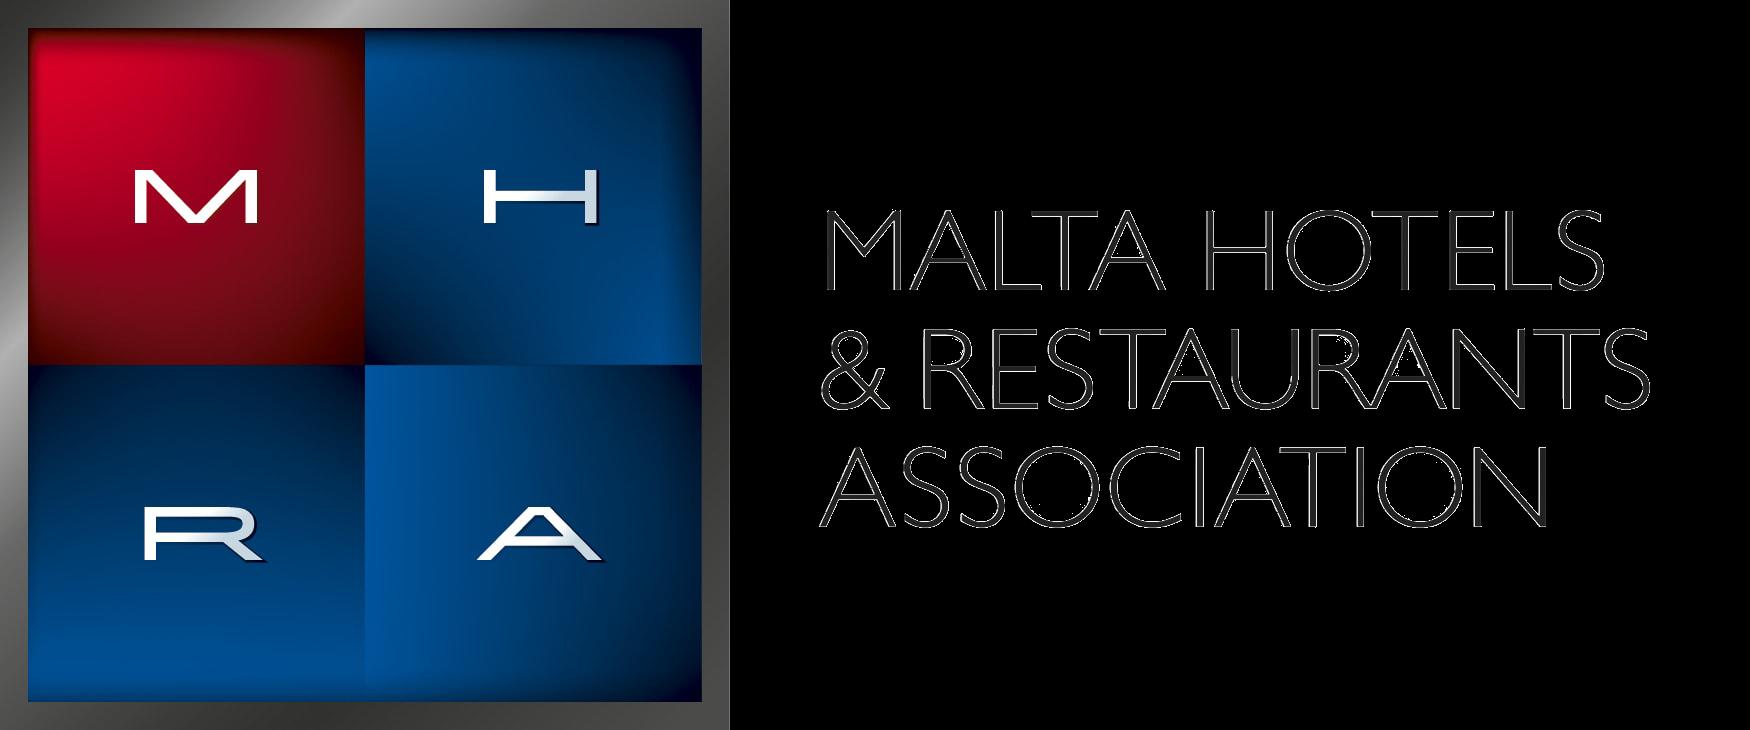 Malta Hotels and Restaurants Association